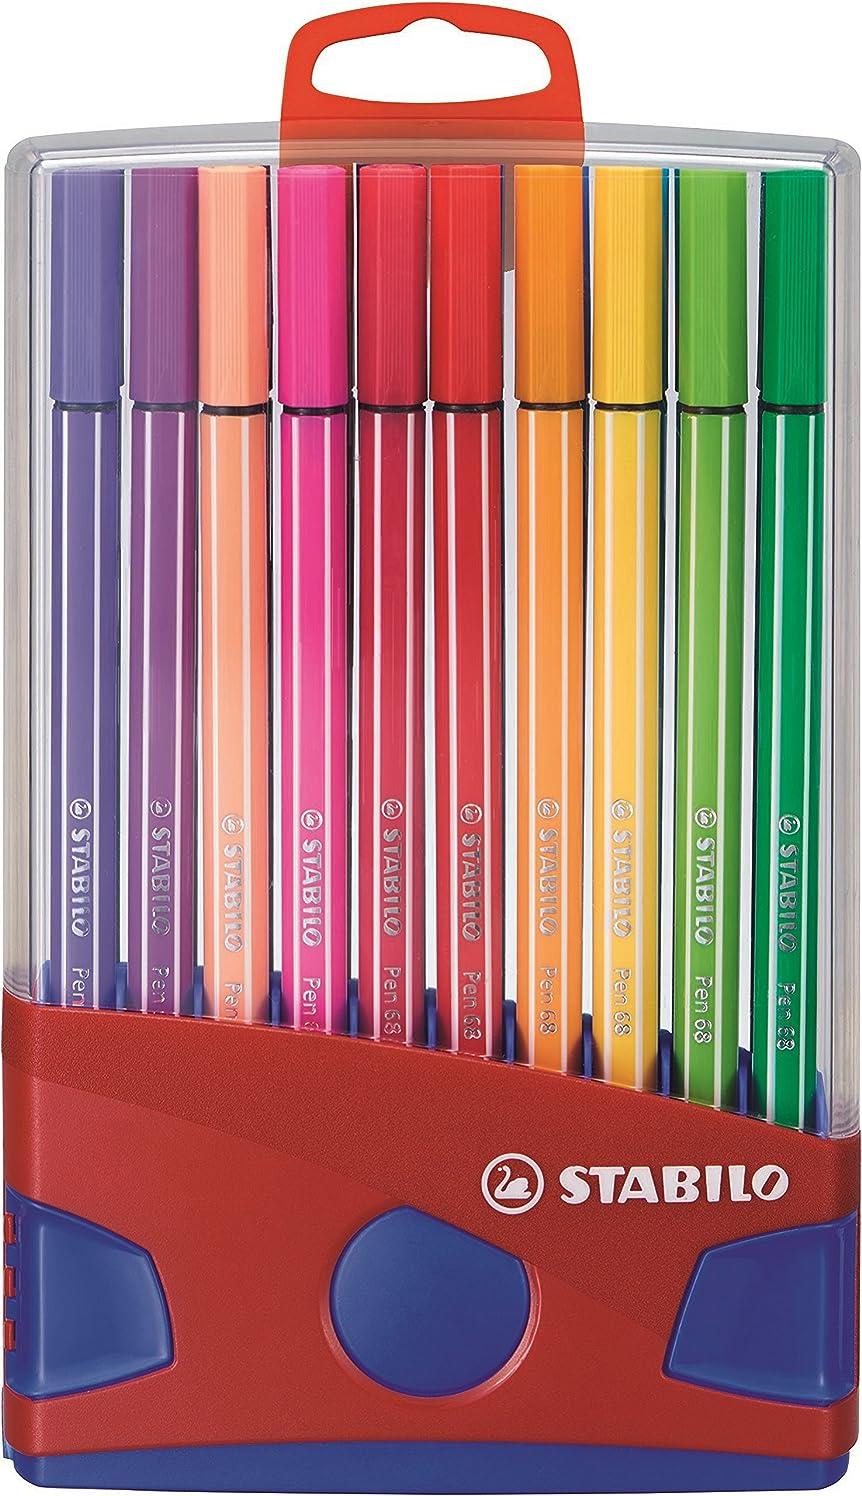 STABILO Pen 68 Fibre-tip Pen, Colorparade Desk Set in 20 Assorted Colours